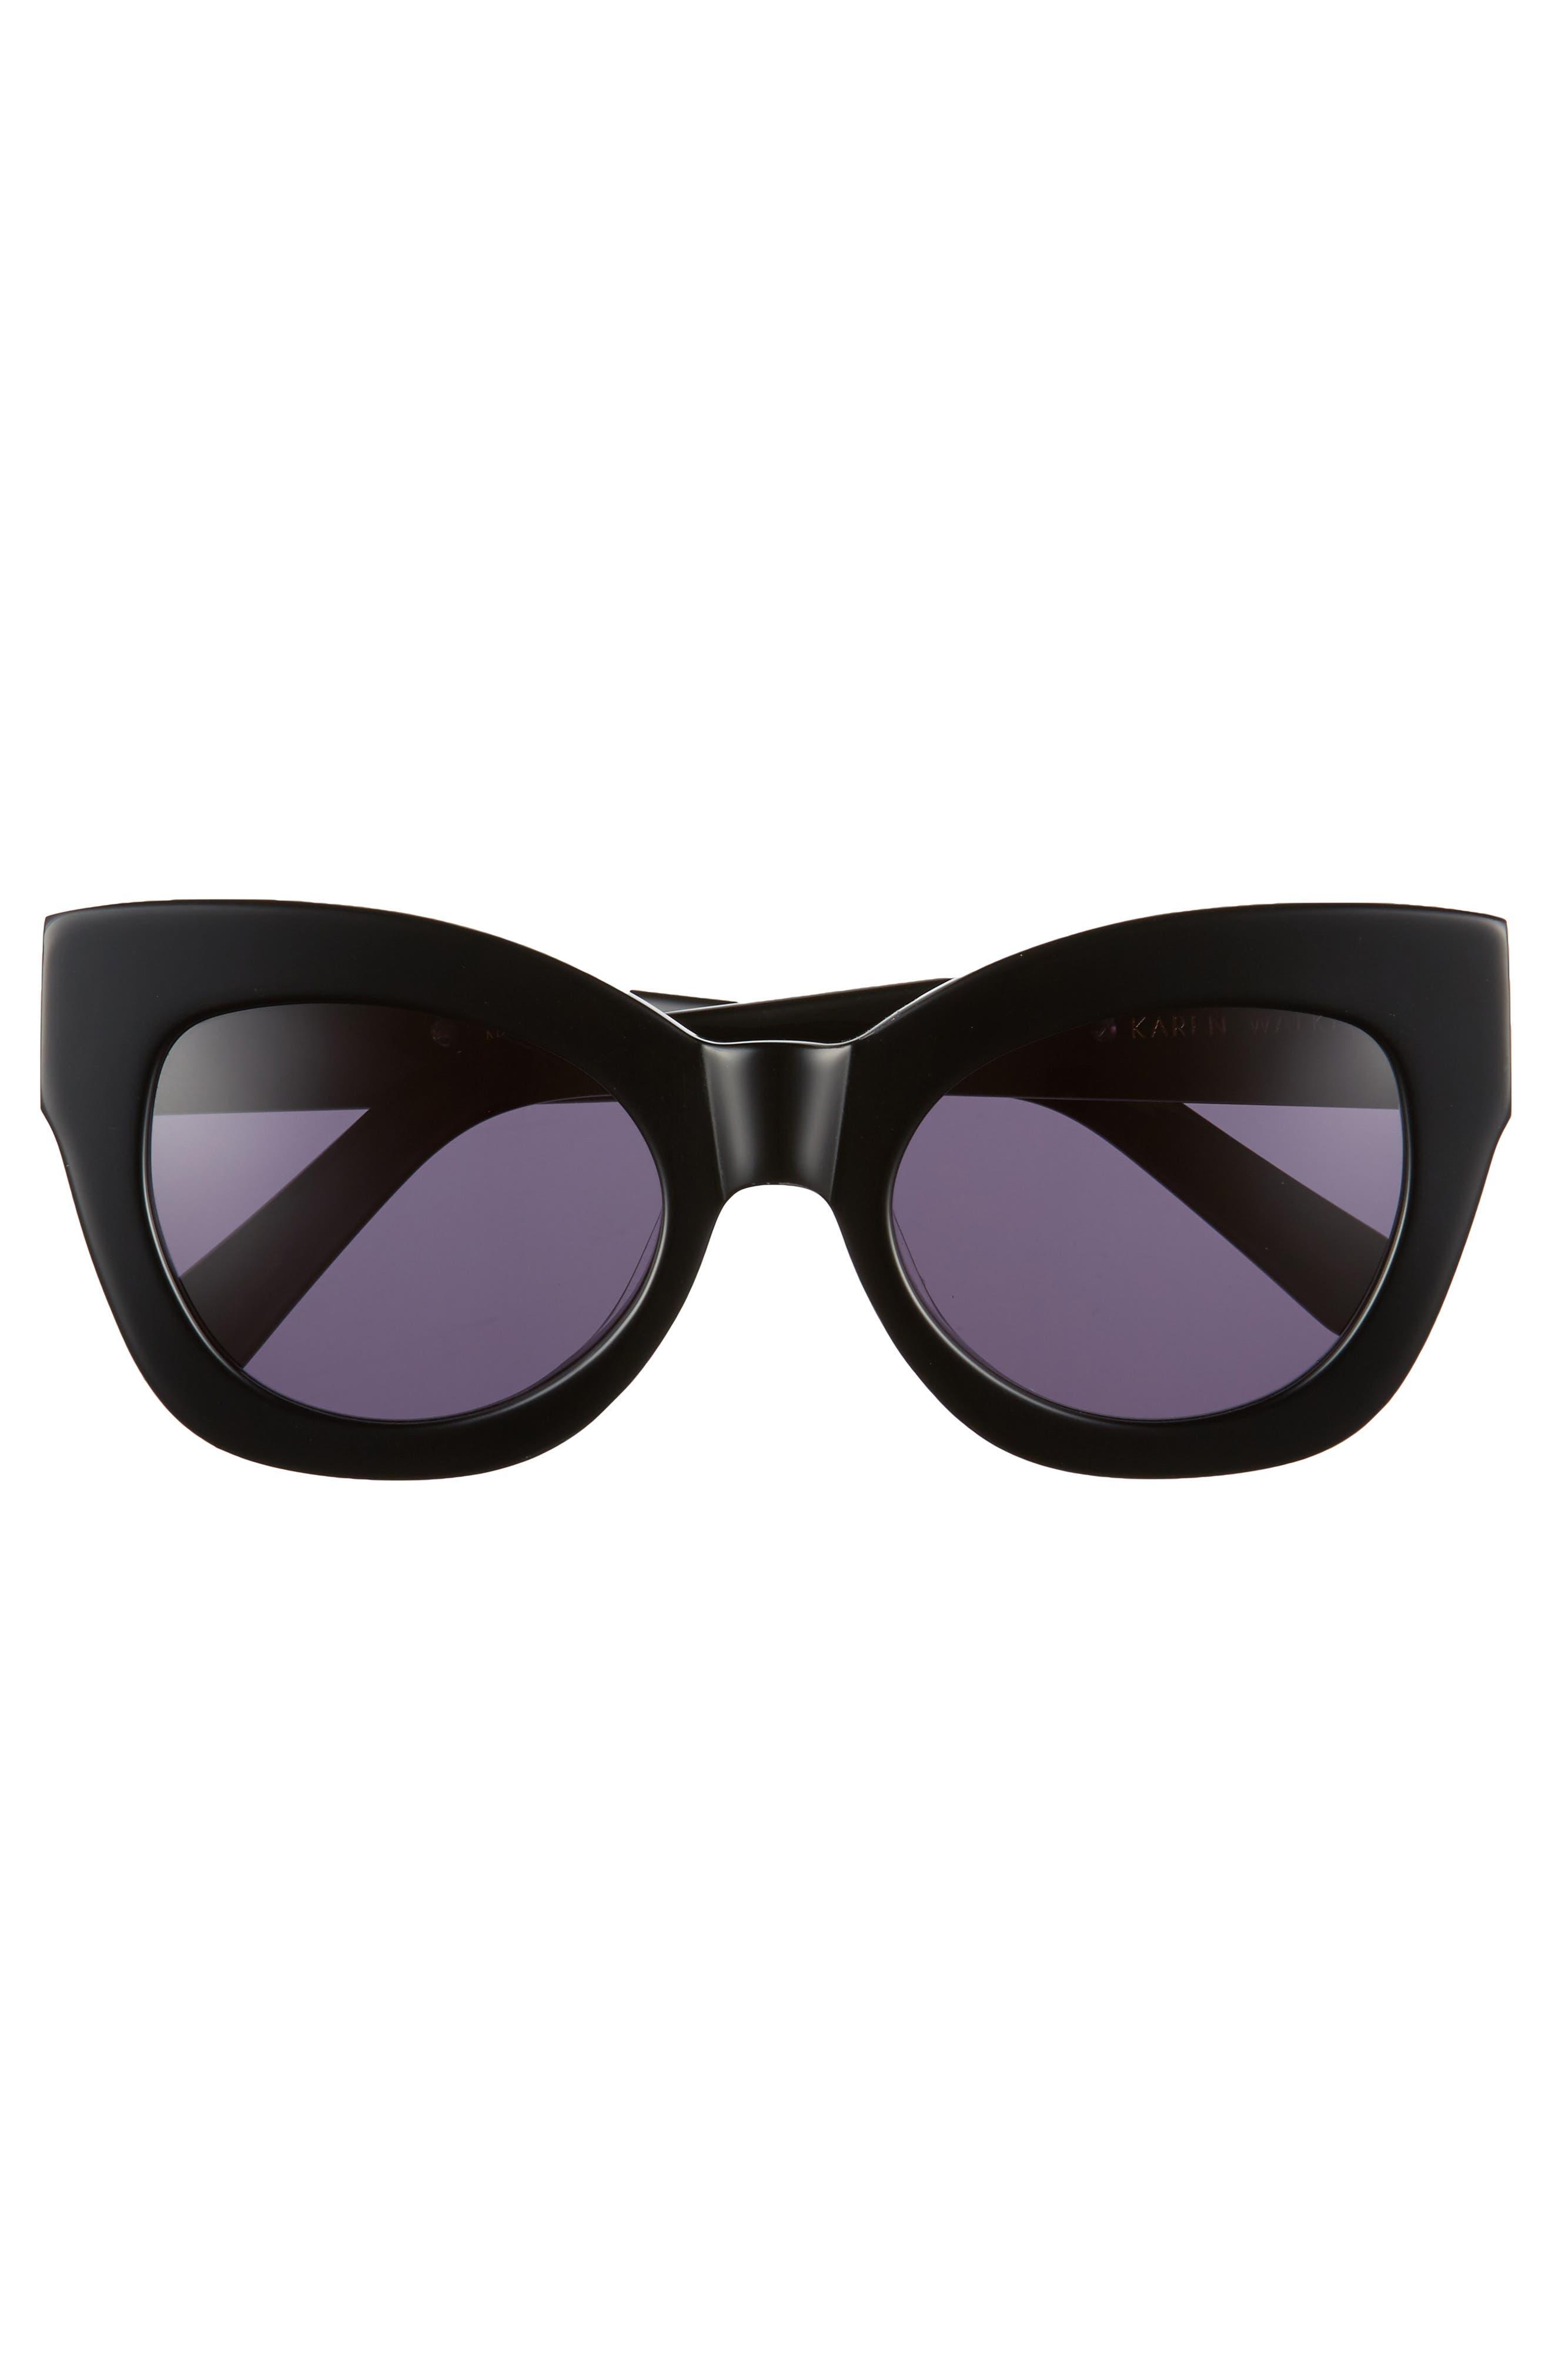 Northern Lights V2 51mm Cat Eye Sunglasses,                             Alternate thumbnail 3, color,                             001